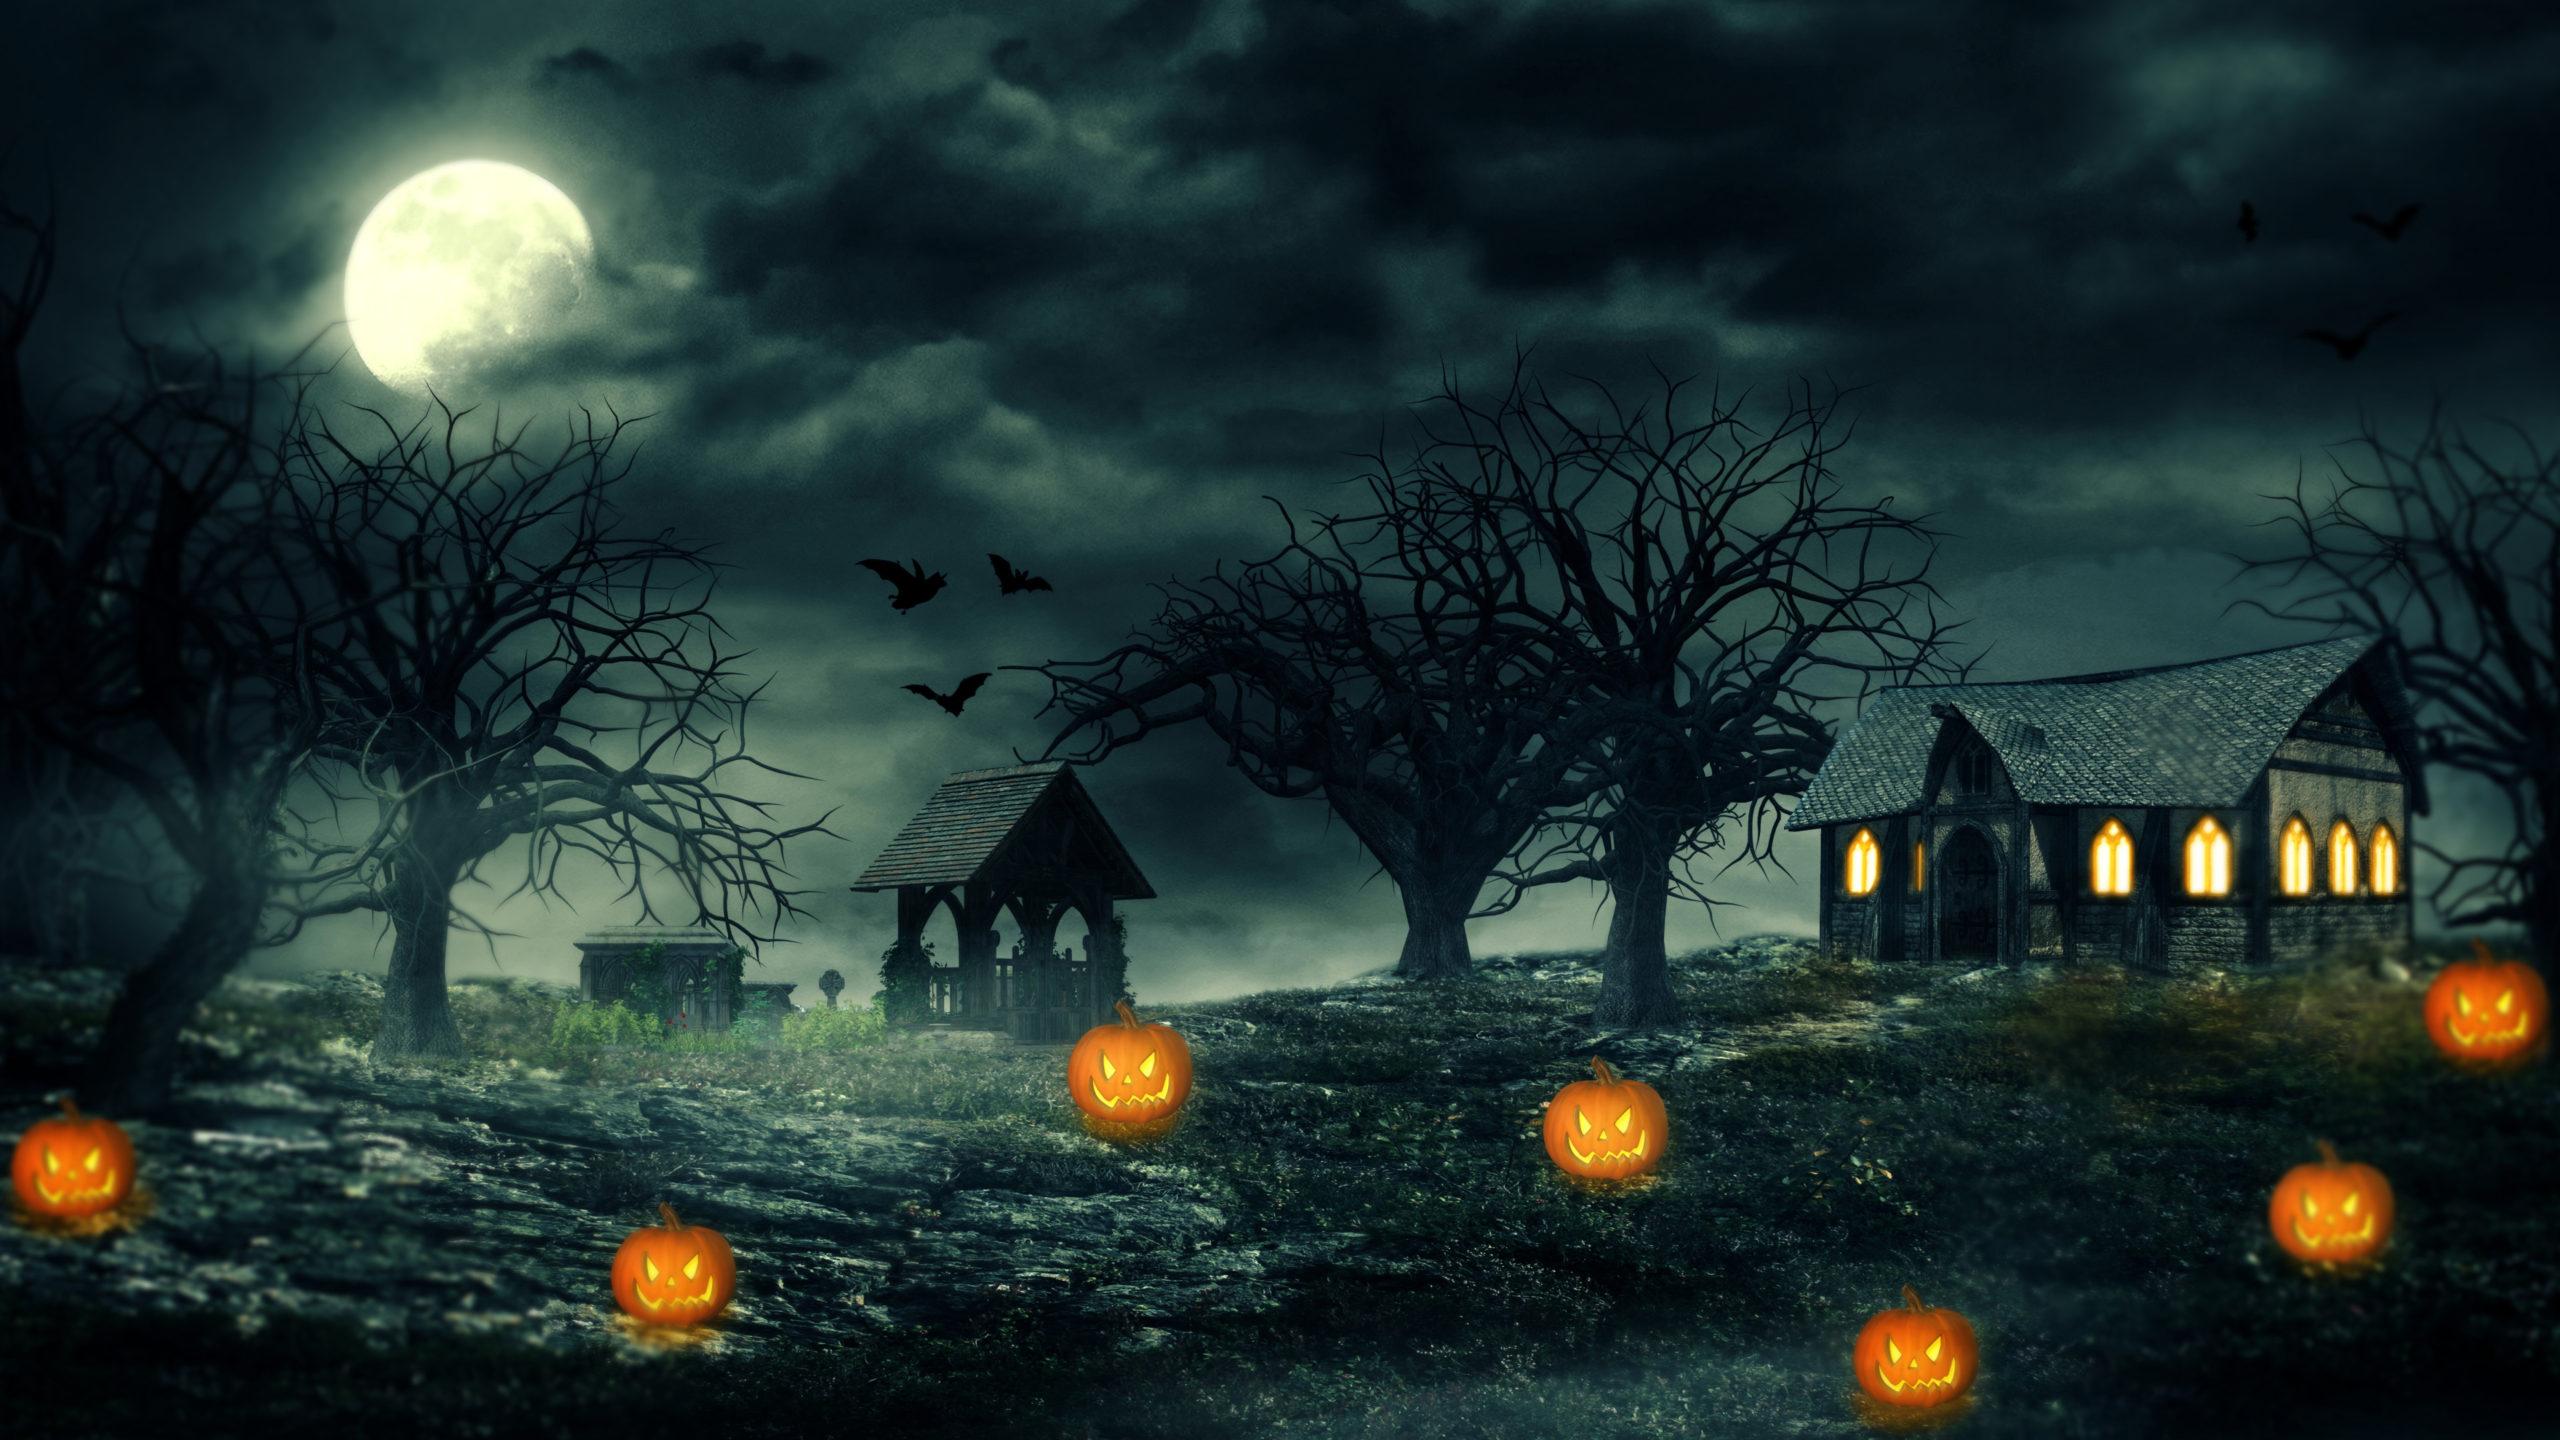 qhd-horror-image